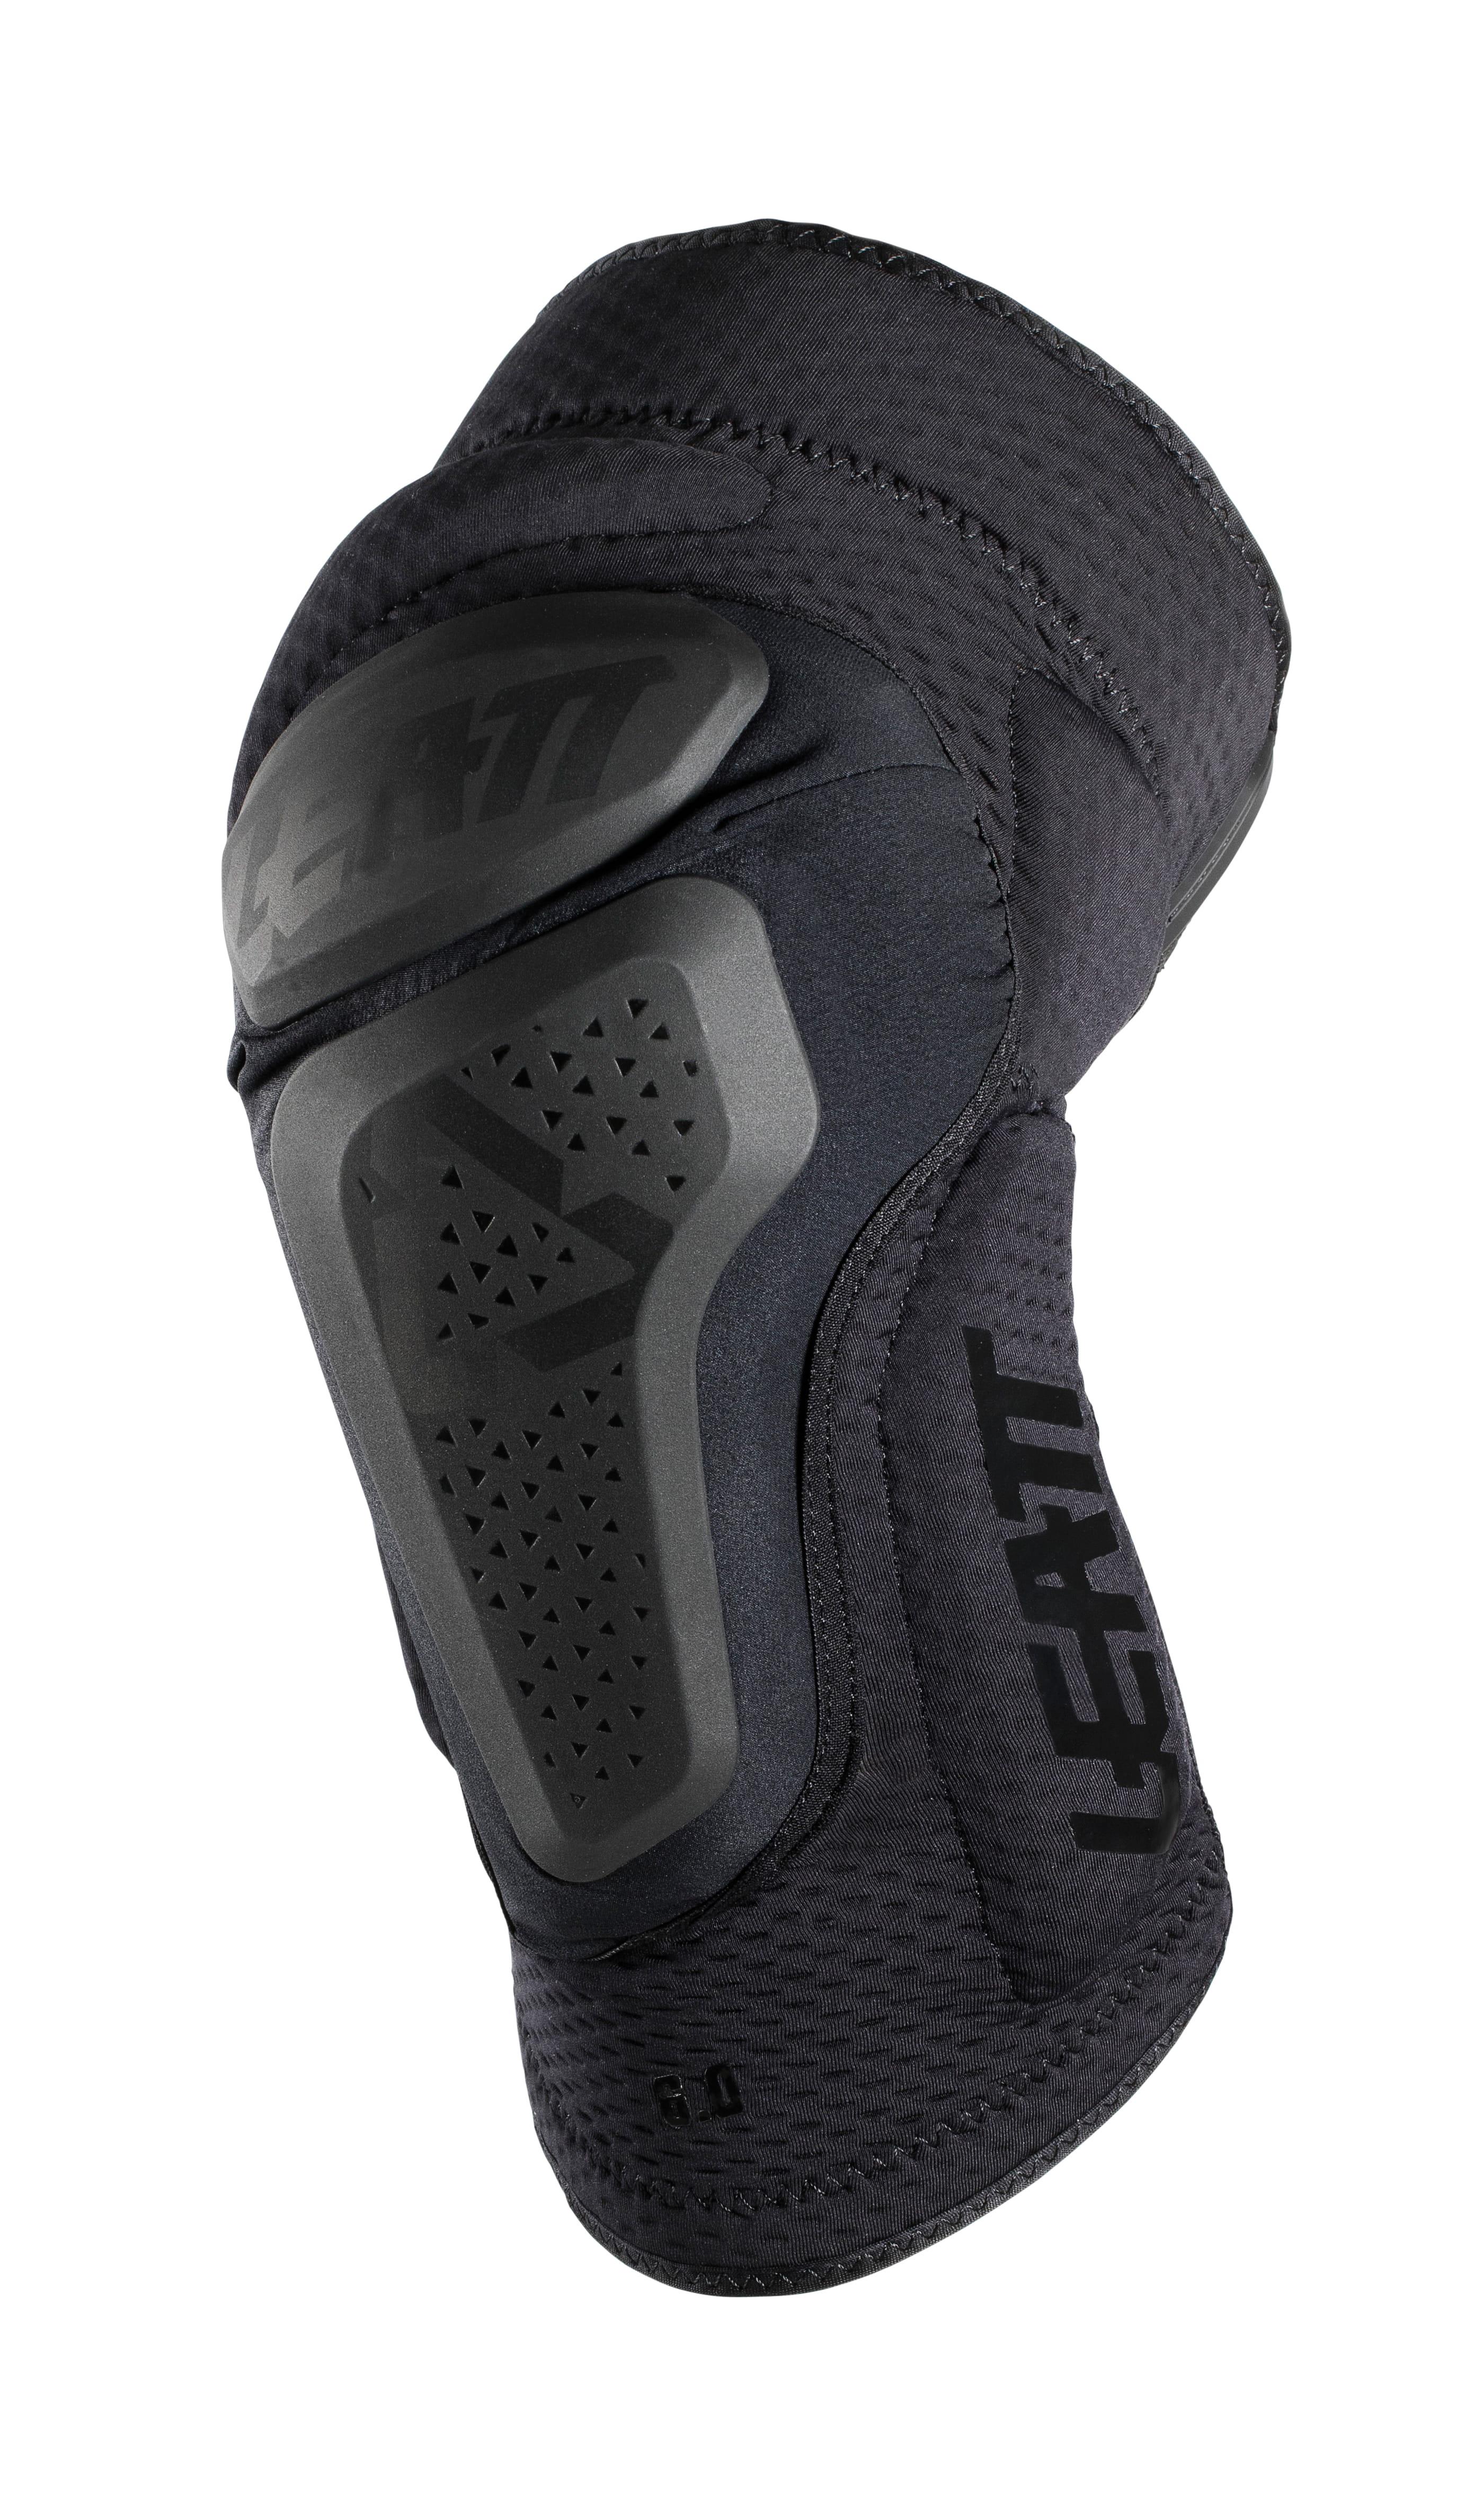 Leatt Forearm Elbow Protectors Hard Shell Schwarz